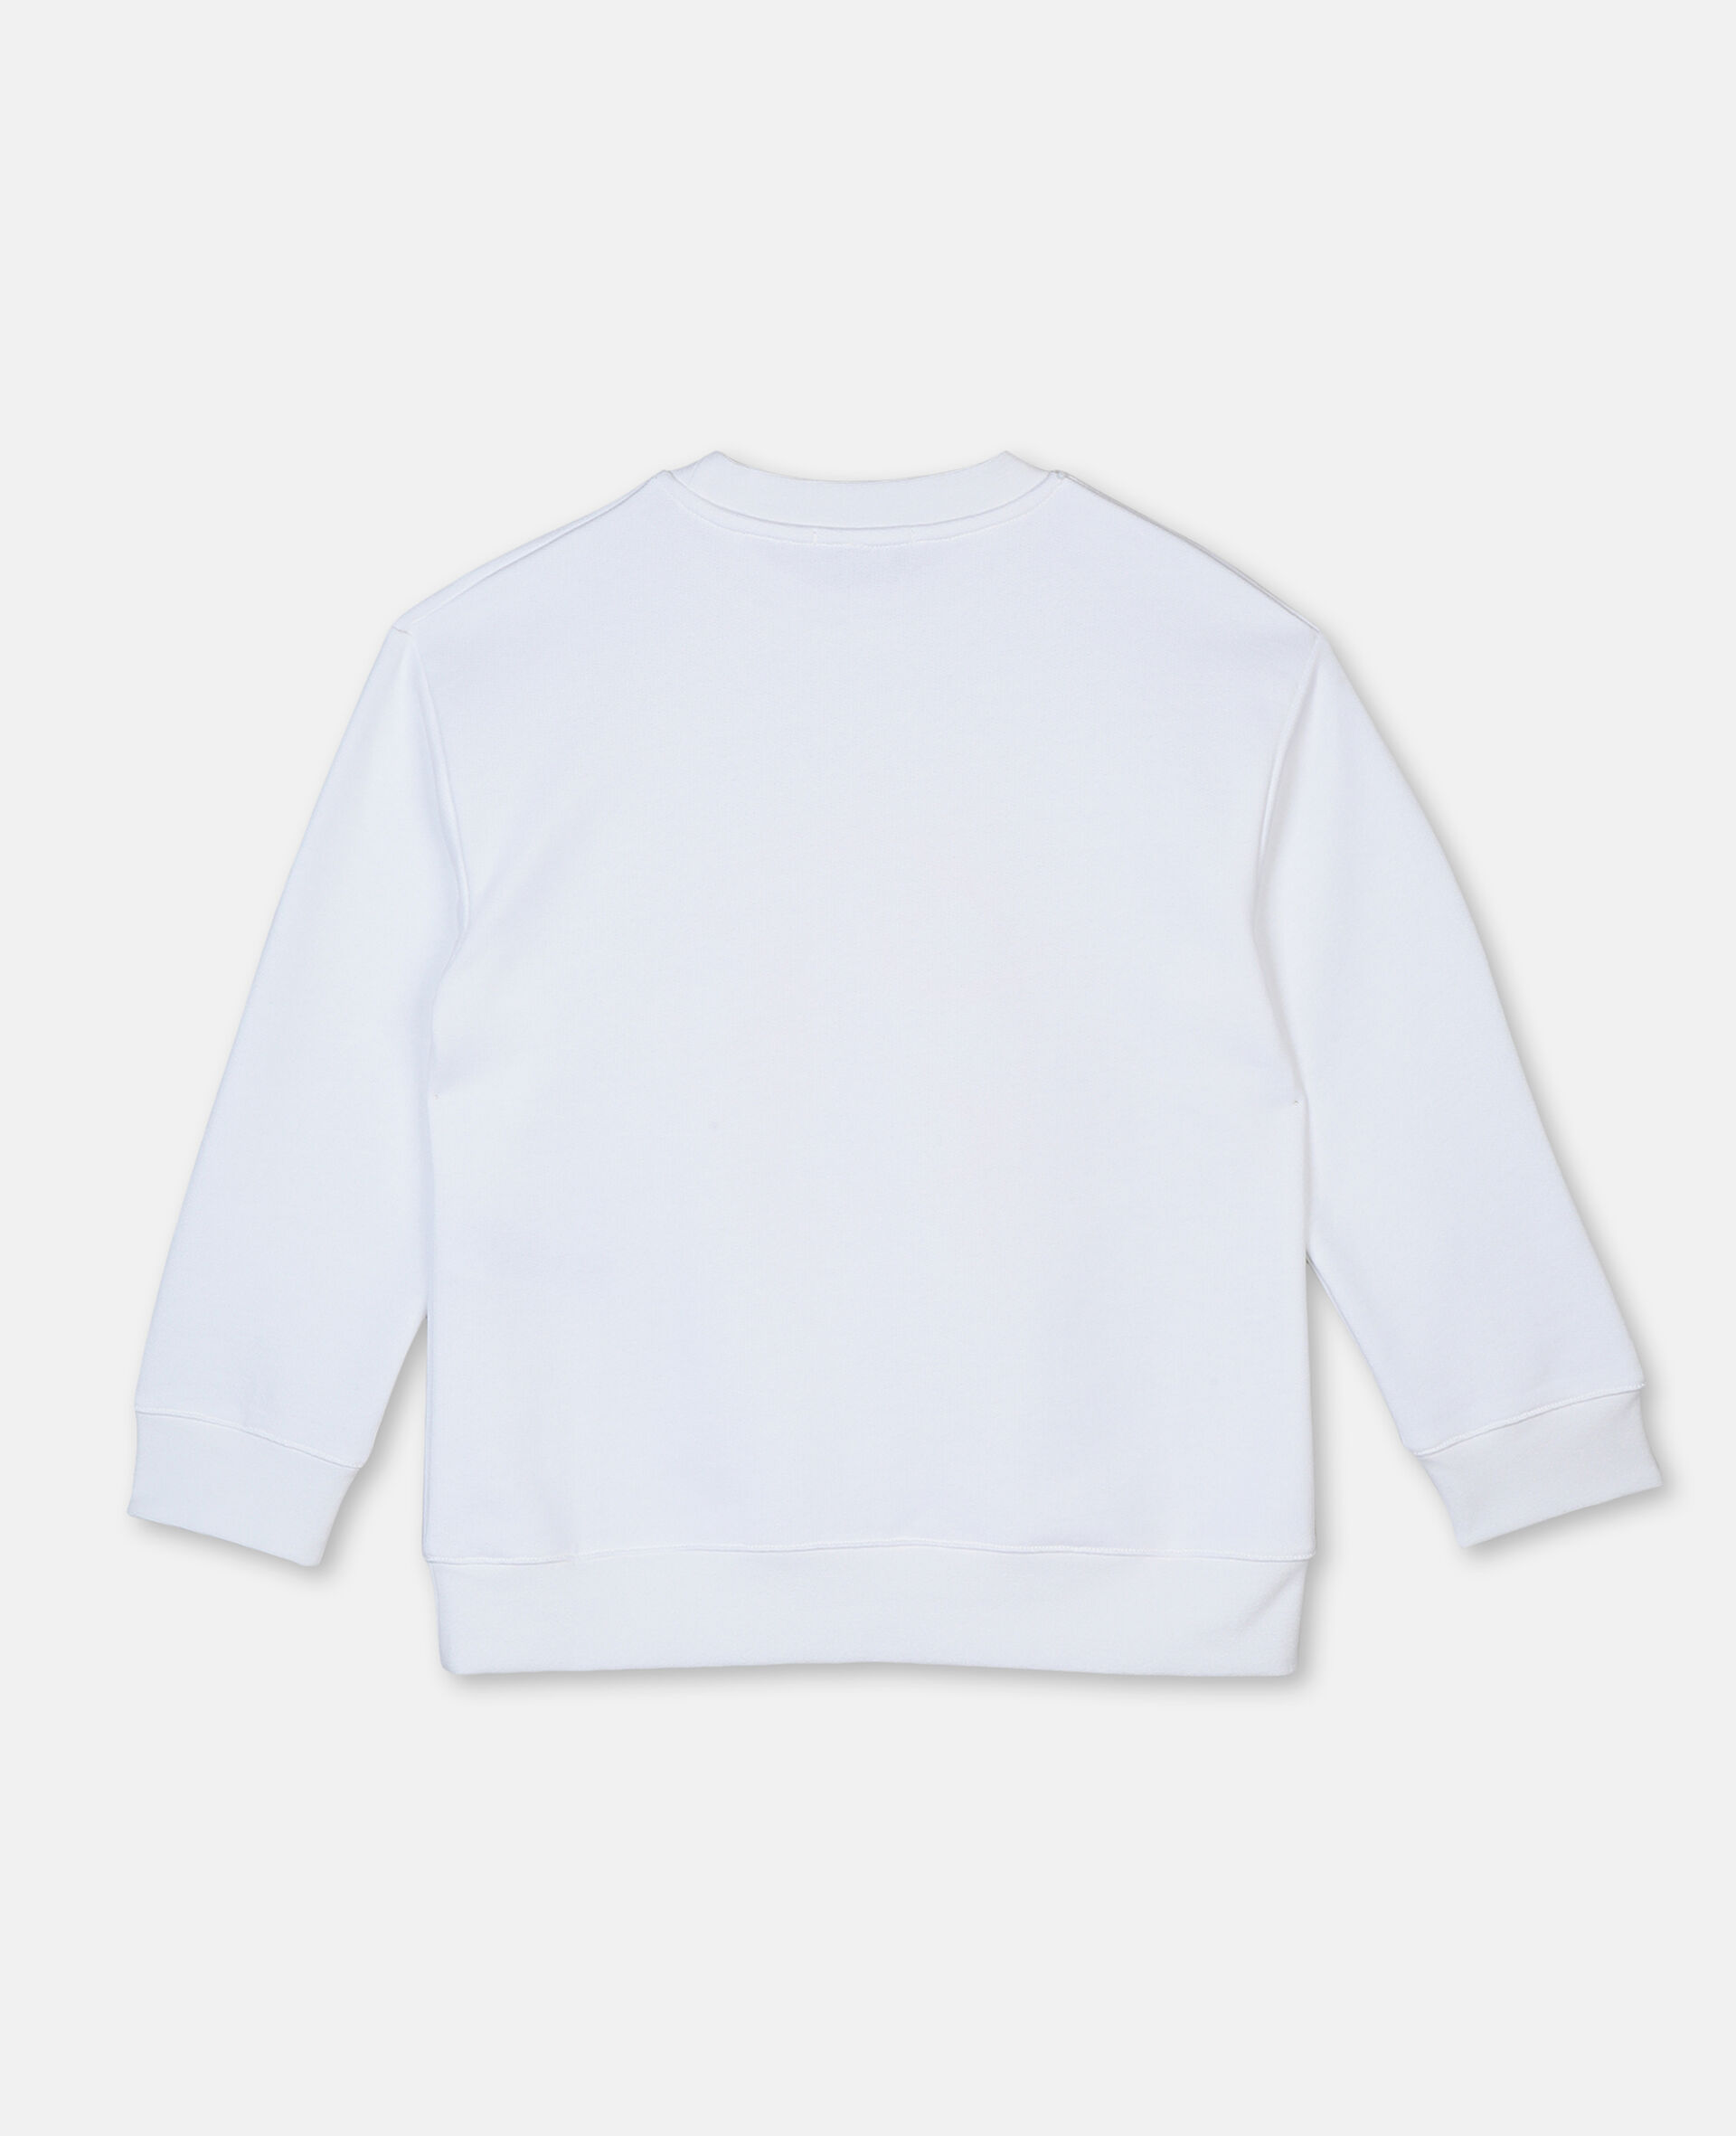 Oversized-Sweatshirt aus Baumwolle mit Basketball-Print -Weiß-large image number 3